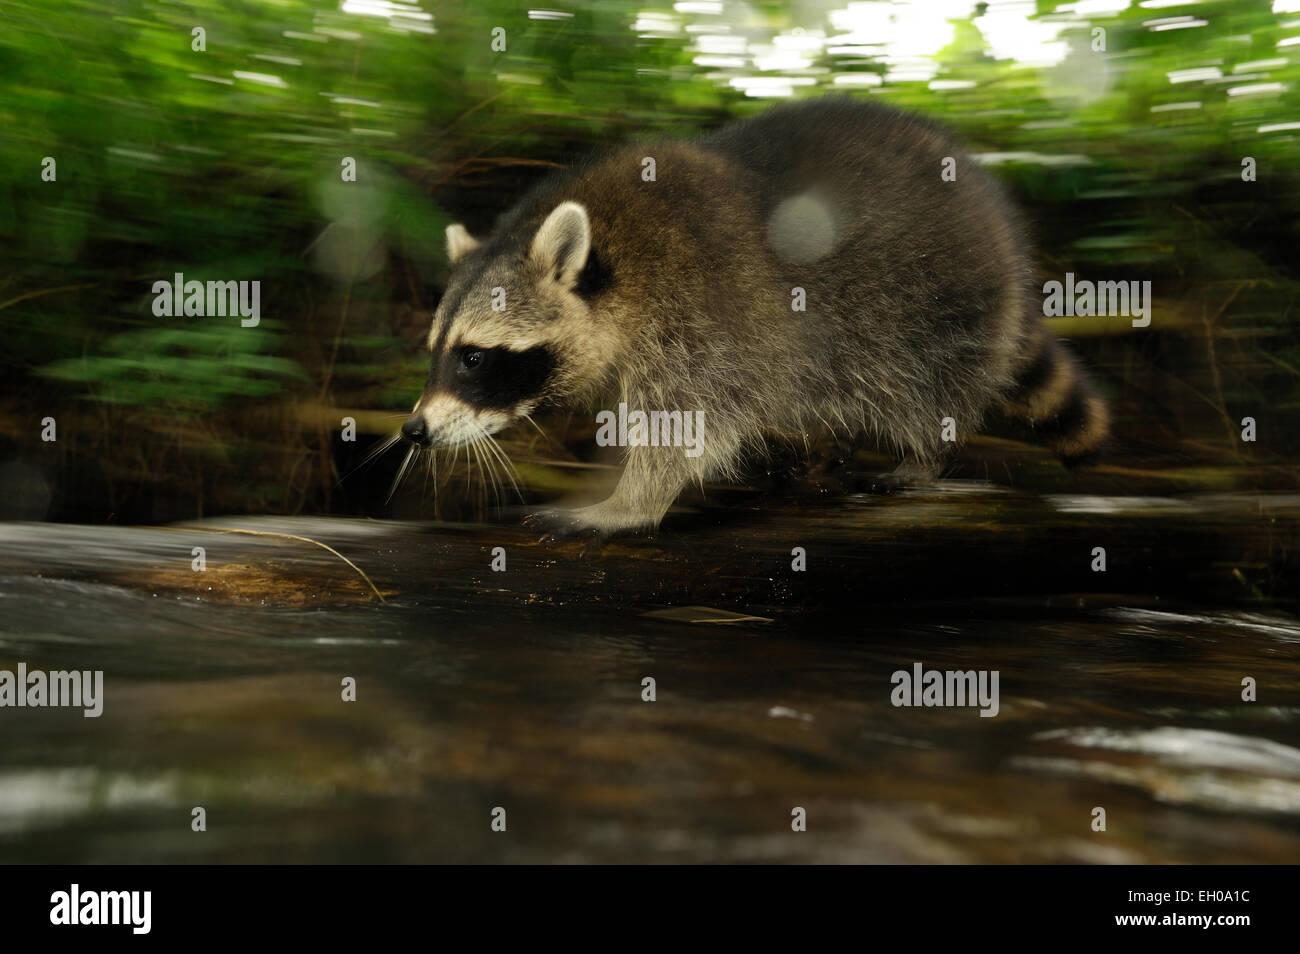 [captive] Raccoon (Procyon lotor) | Waschbär (Procyon lotor) Stock Photo